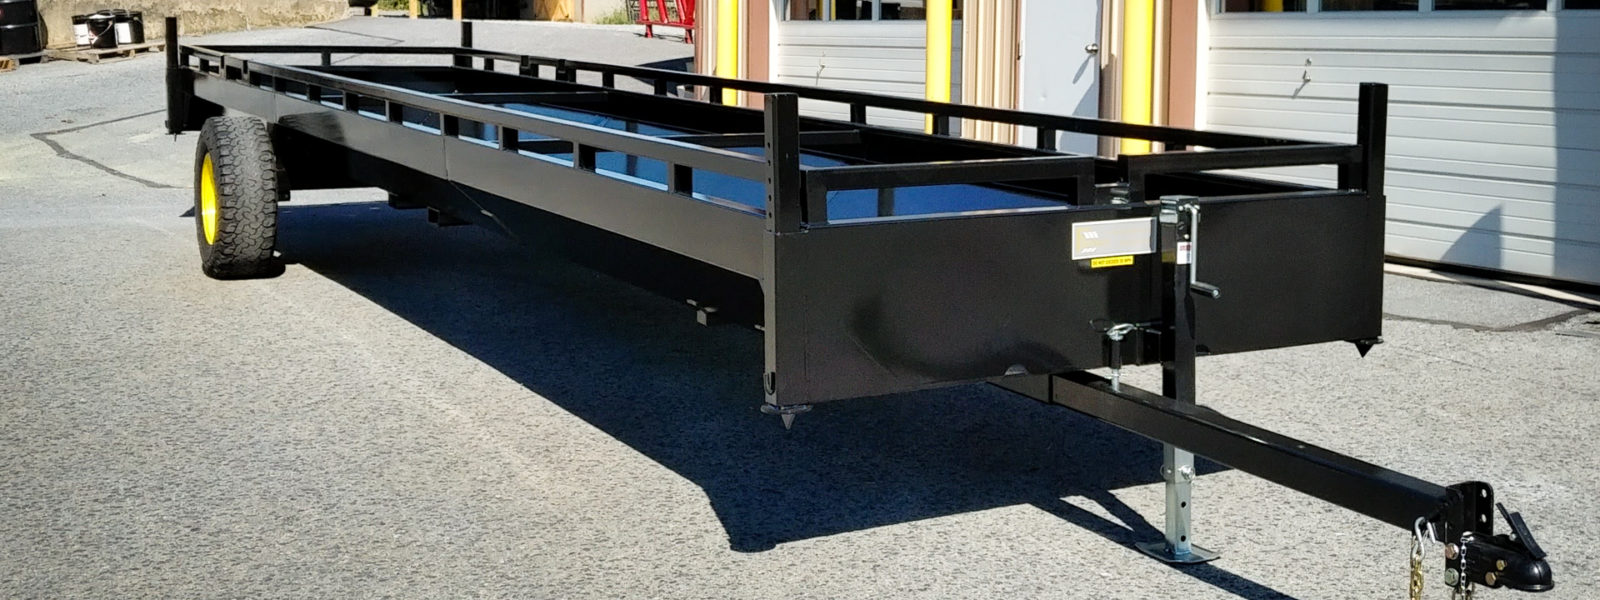 large black custom farm equipment trailer